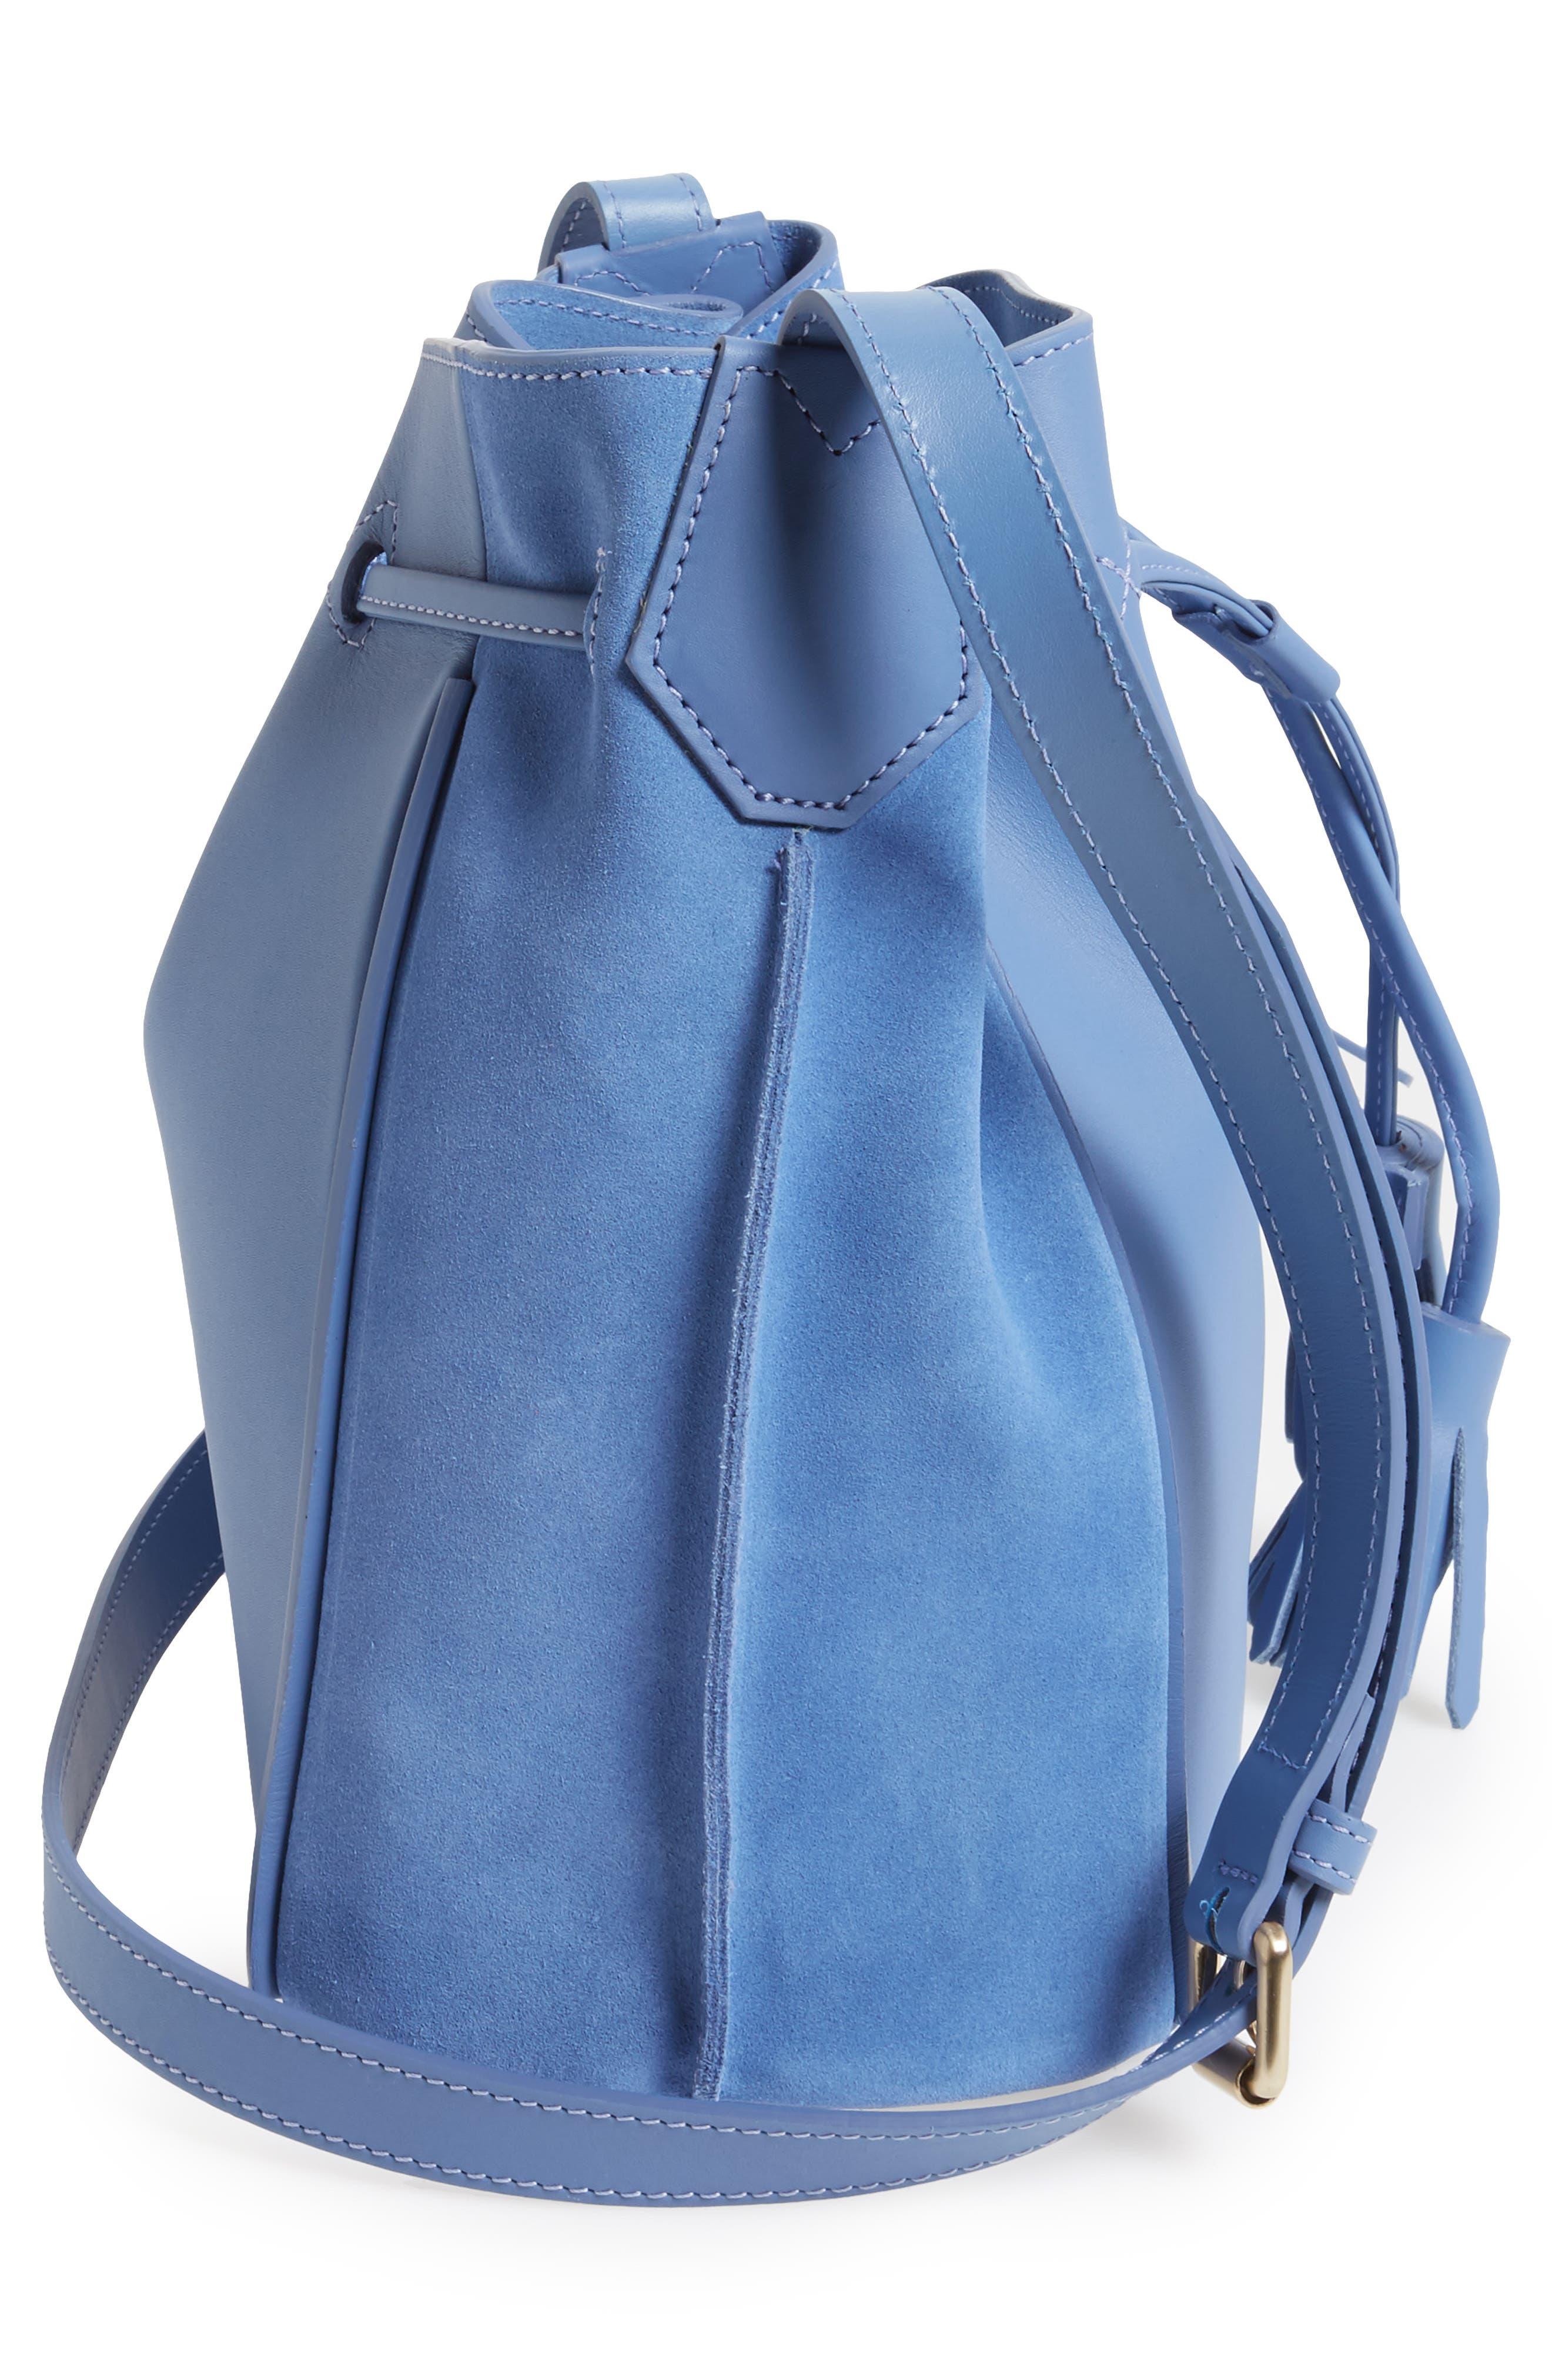 Penelope Fantasie Leather Bucket Bag,                             Alternate thumbnail 15, color,